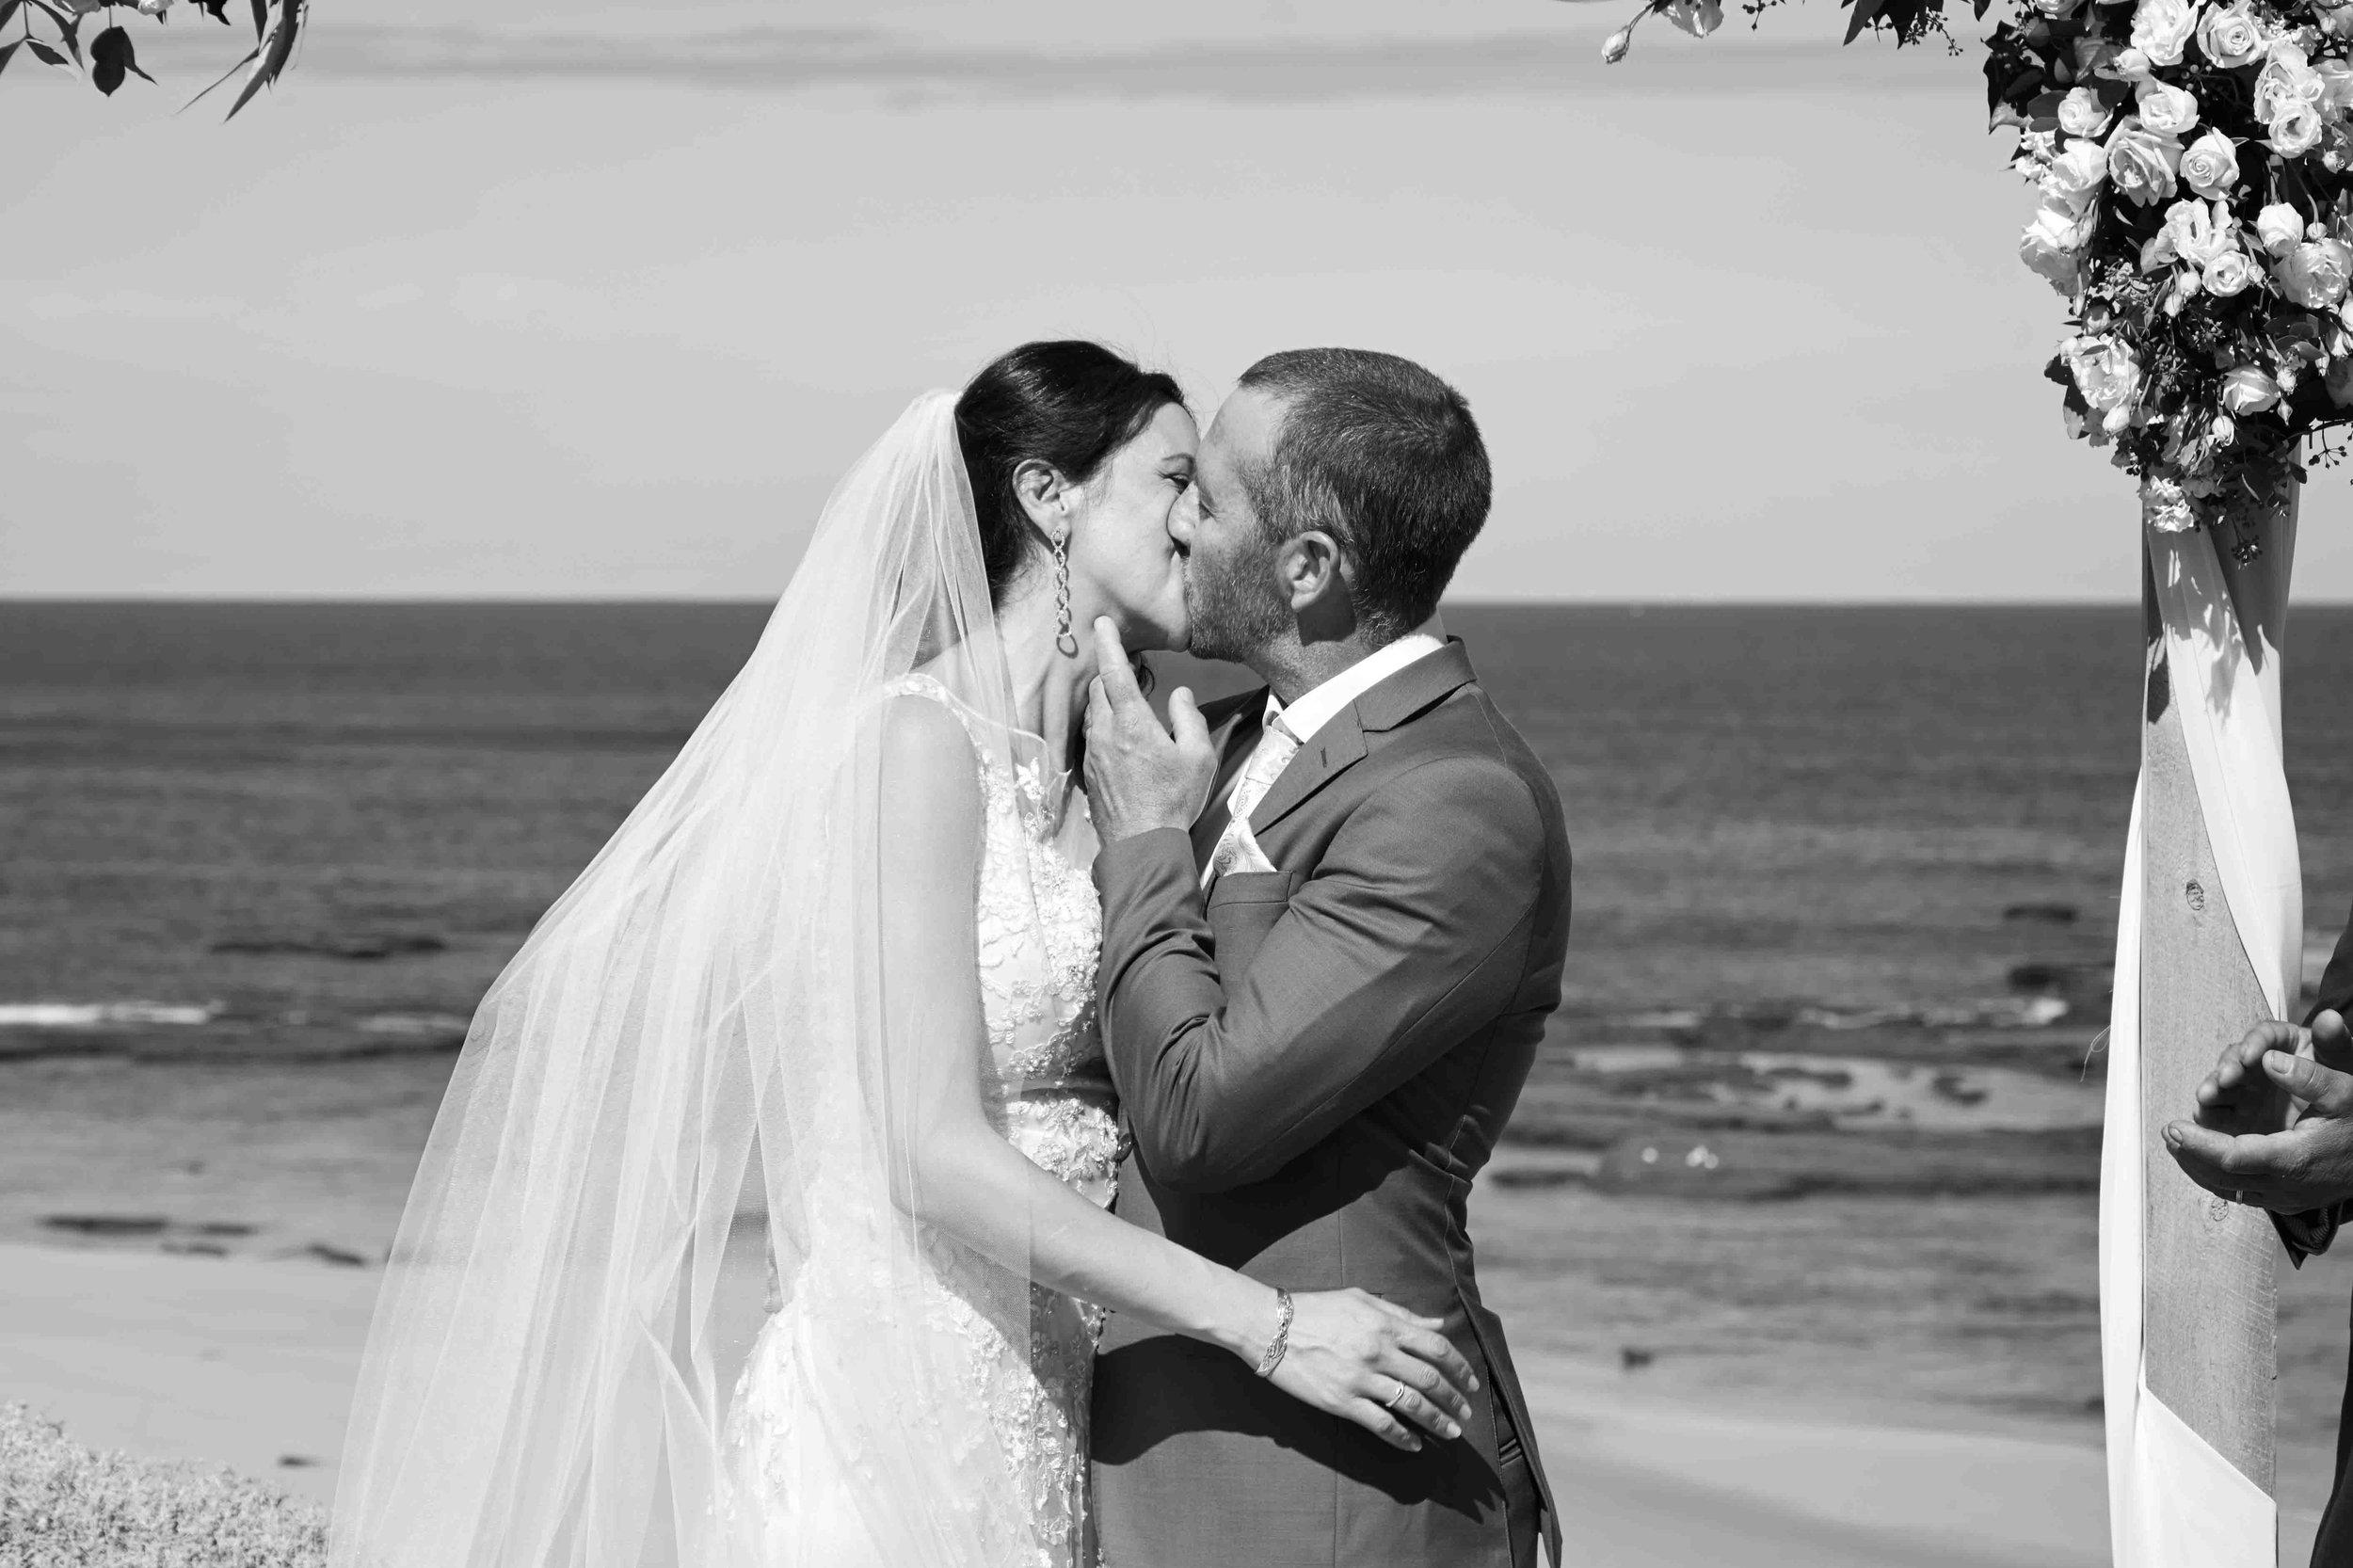 sorrento-wedding-photography-all-smiles-marissa-jade-photography-56.jpg